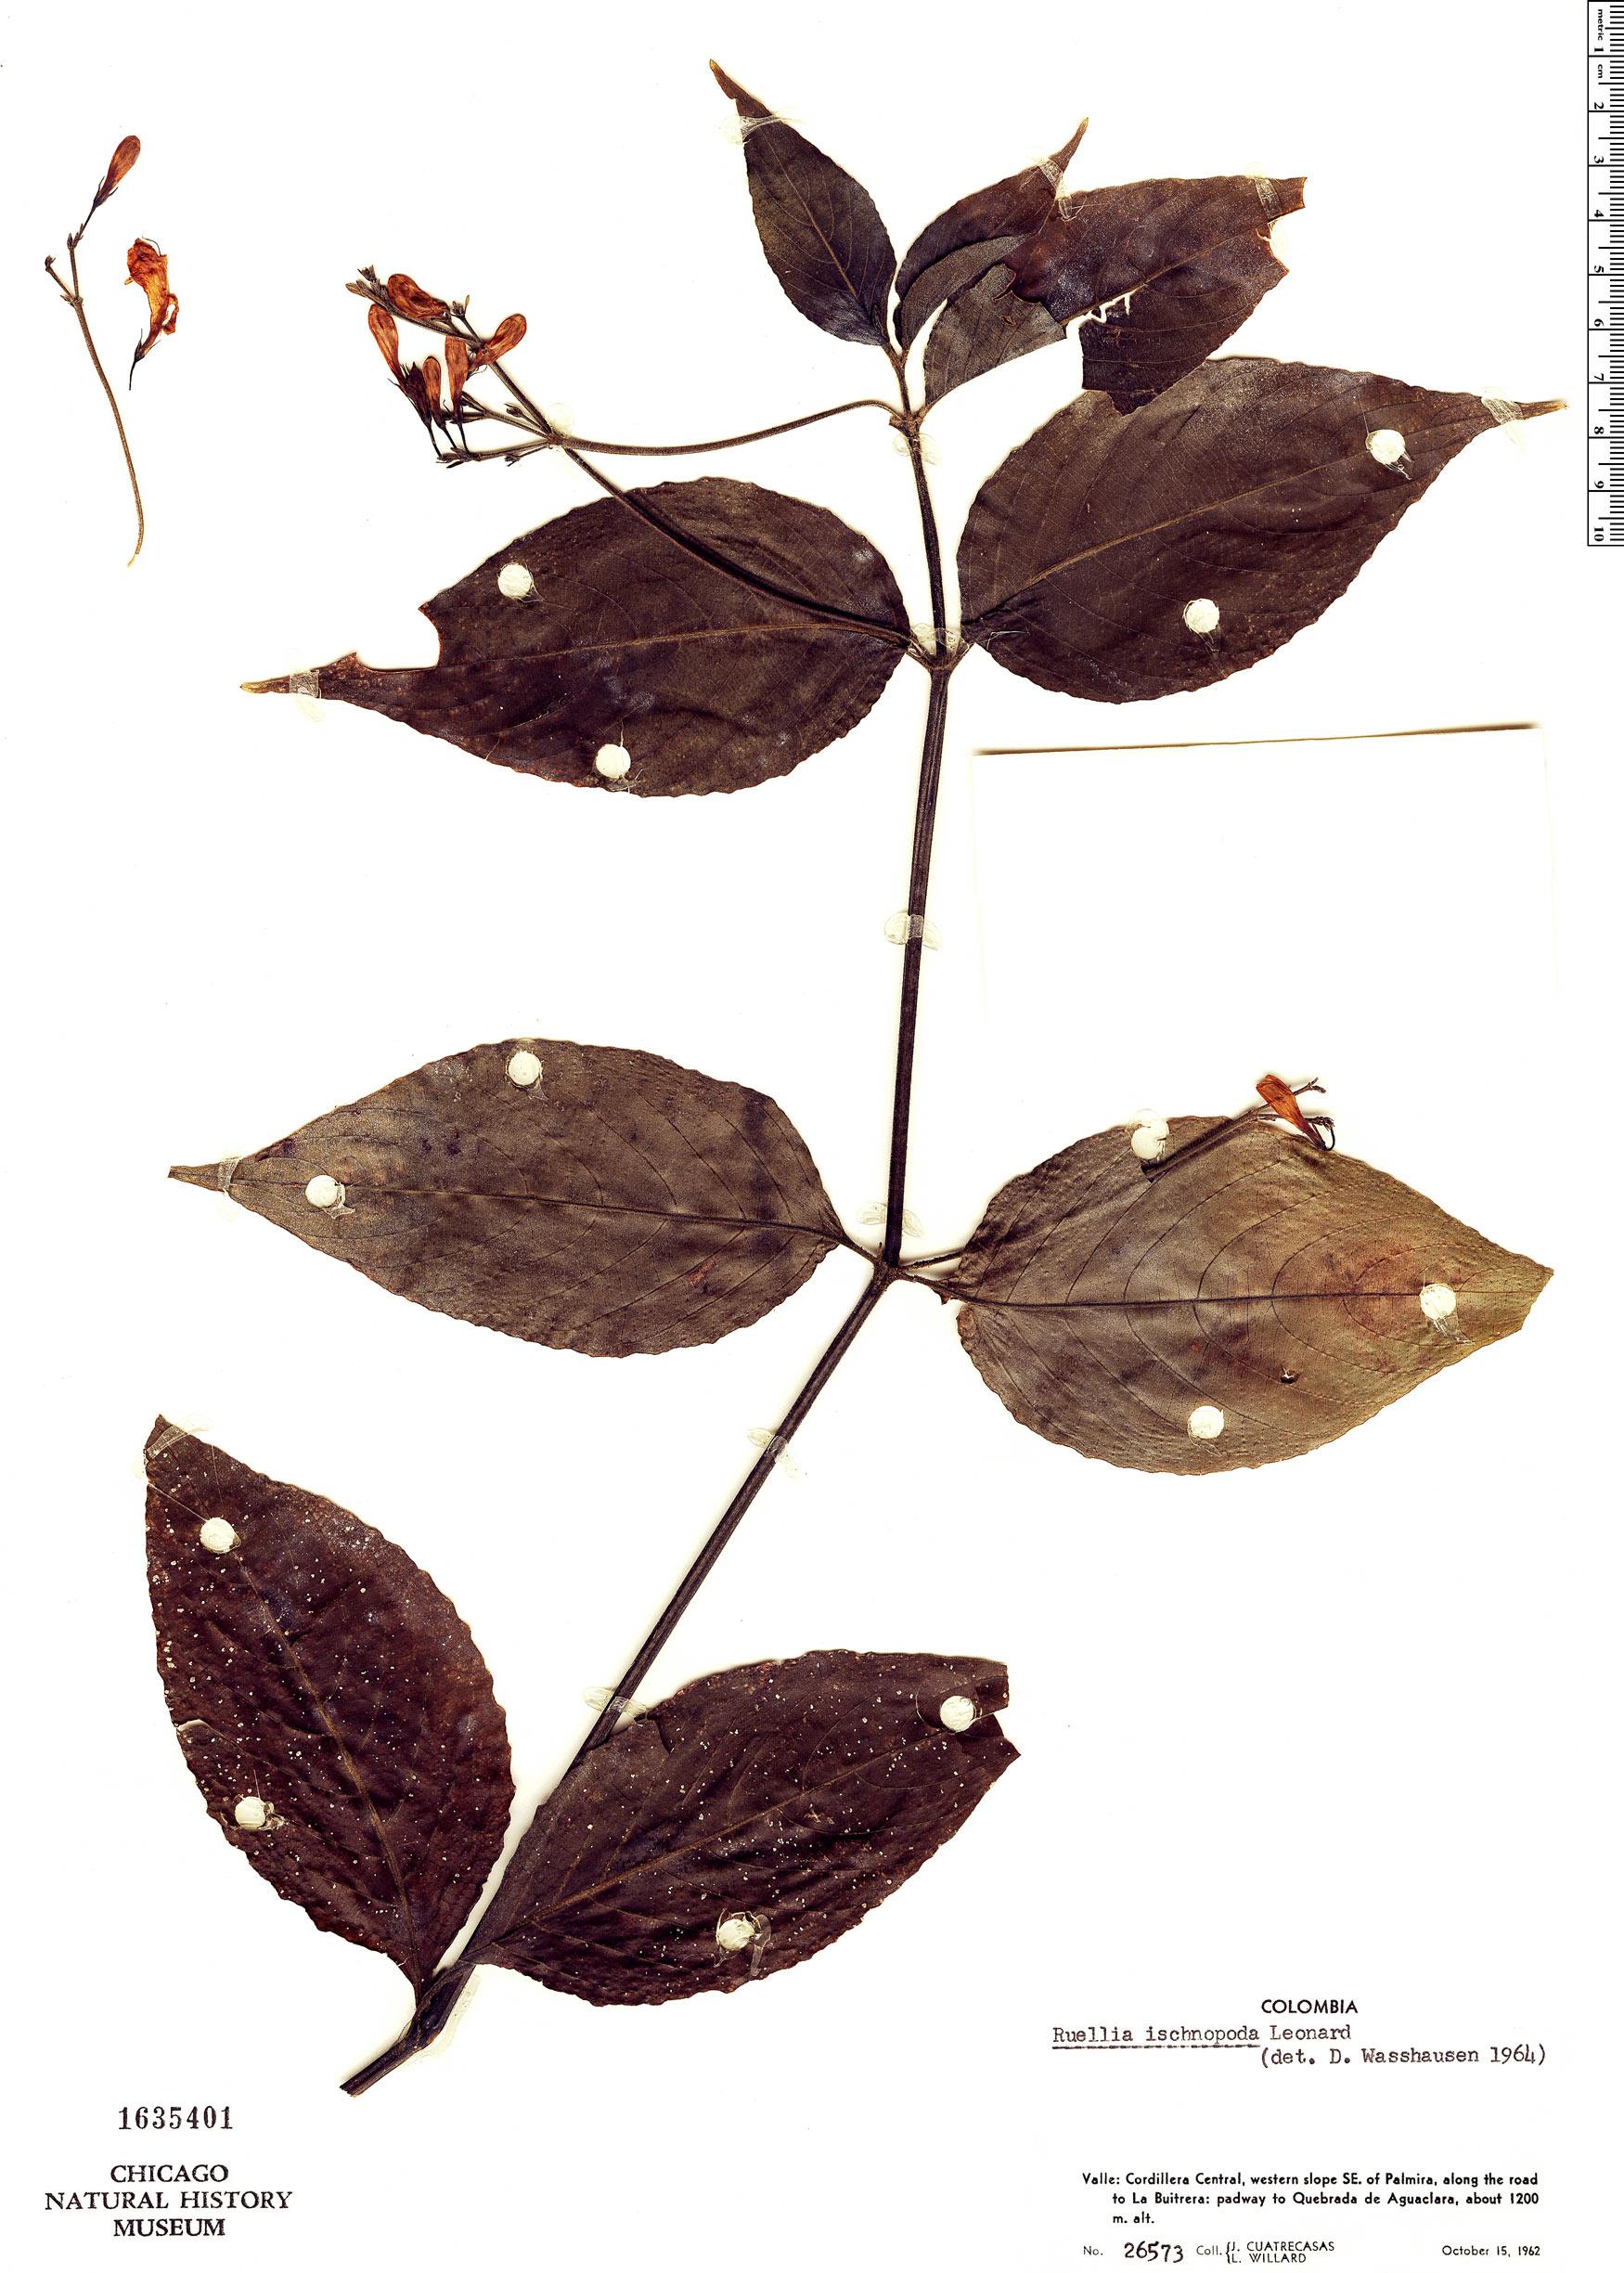 Specimen: Ruellia ischnopoda